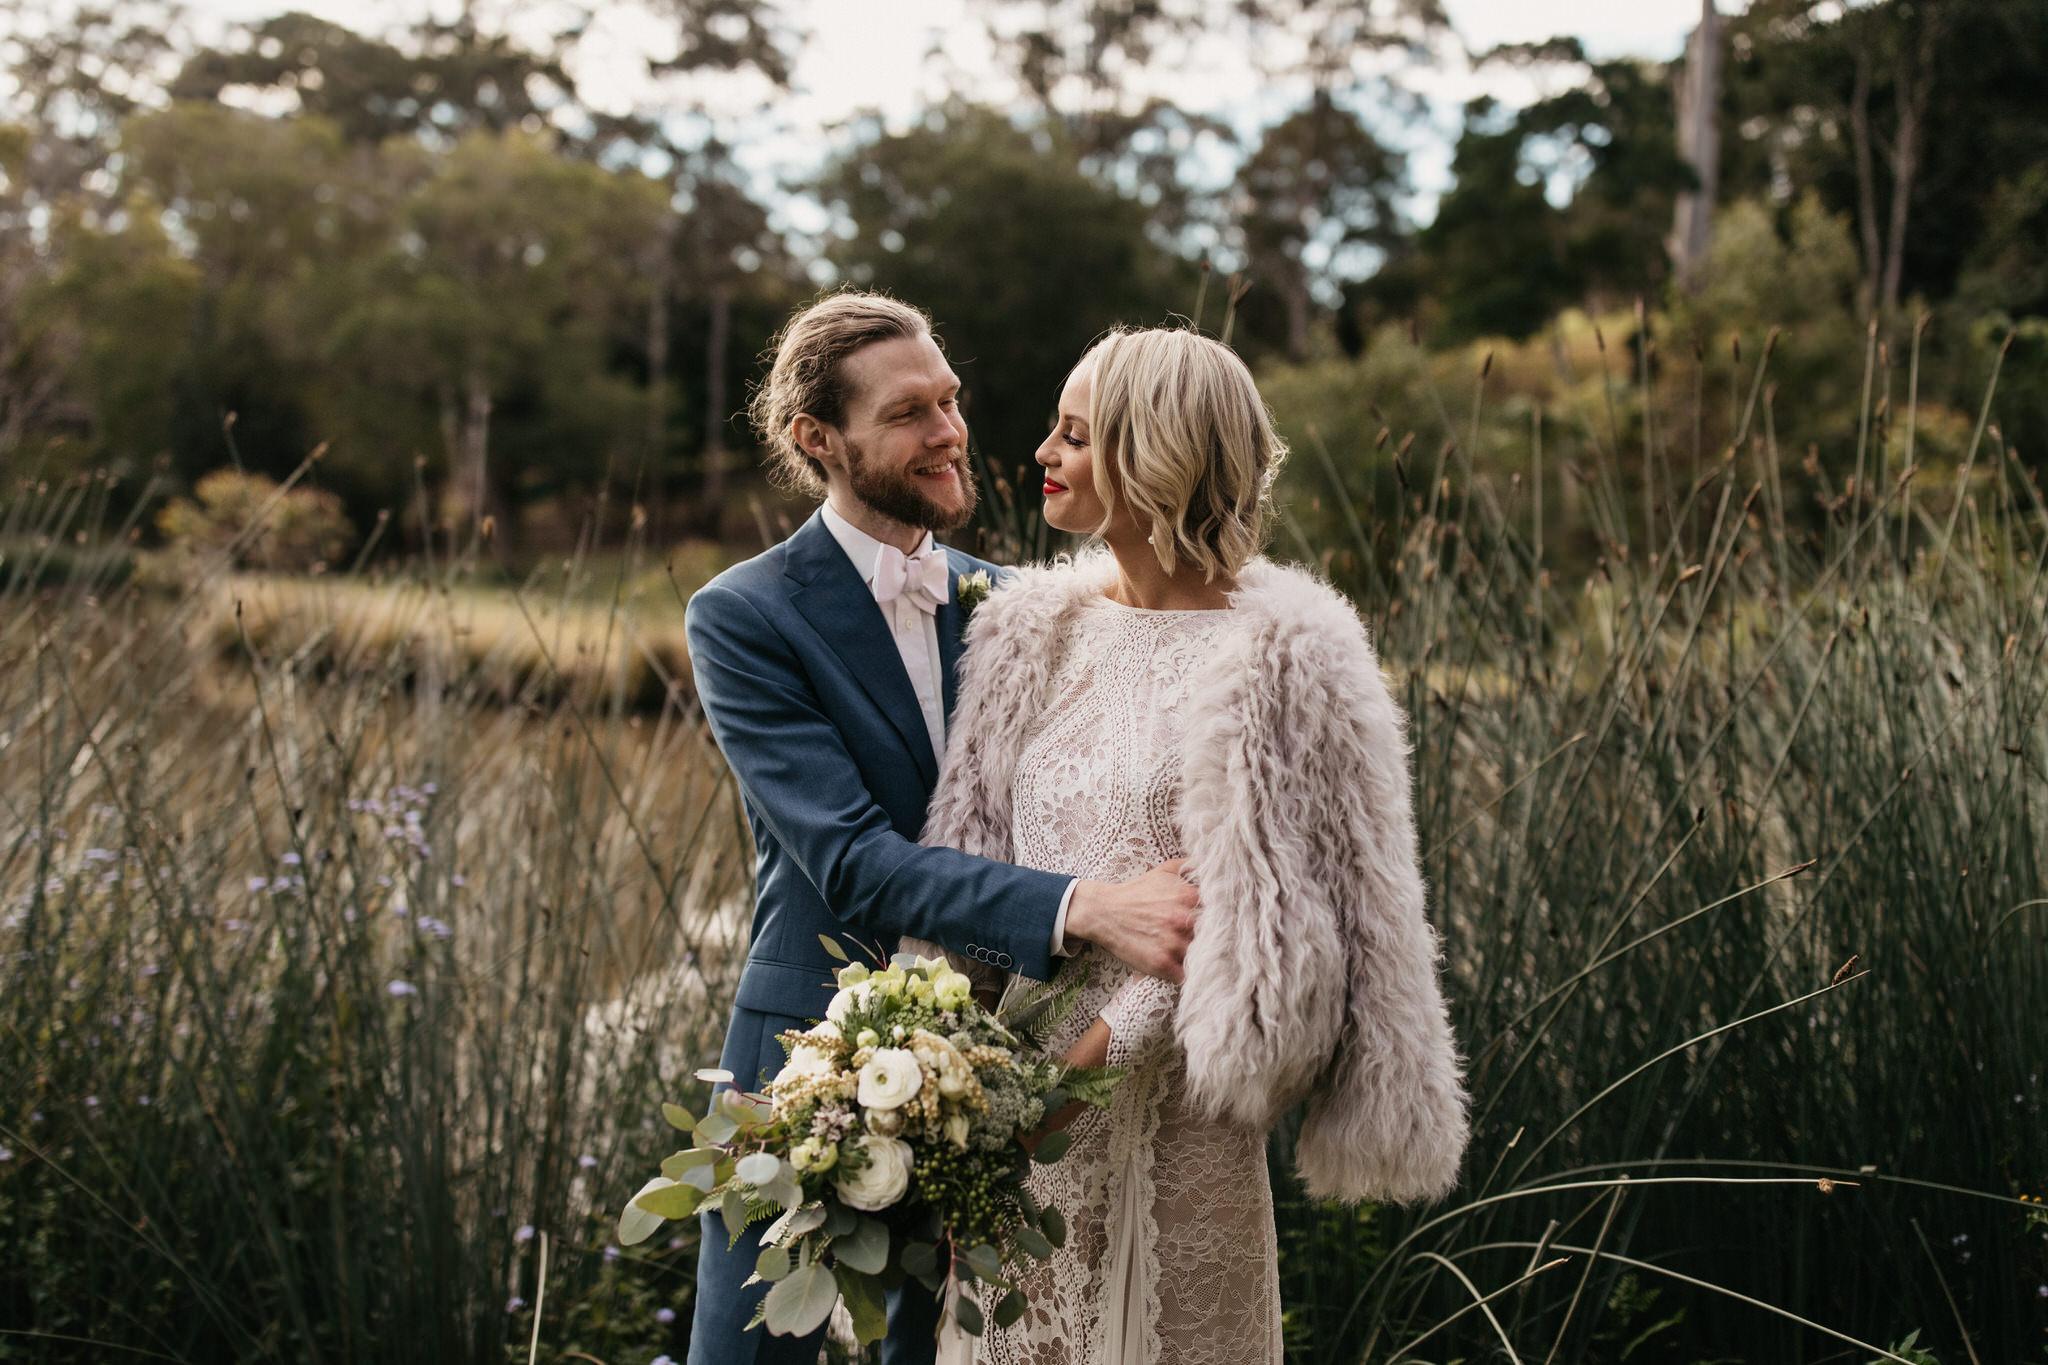 059_SBA-Jen-Tom-Wedding-206_Sunshine_Coast_wedding_photographer.jpg